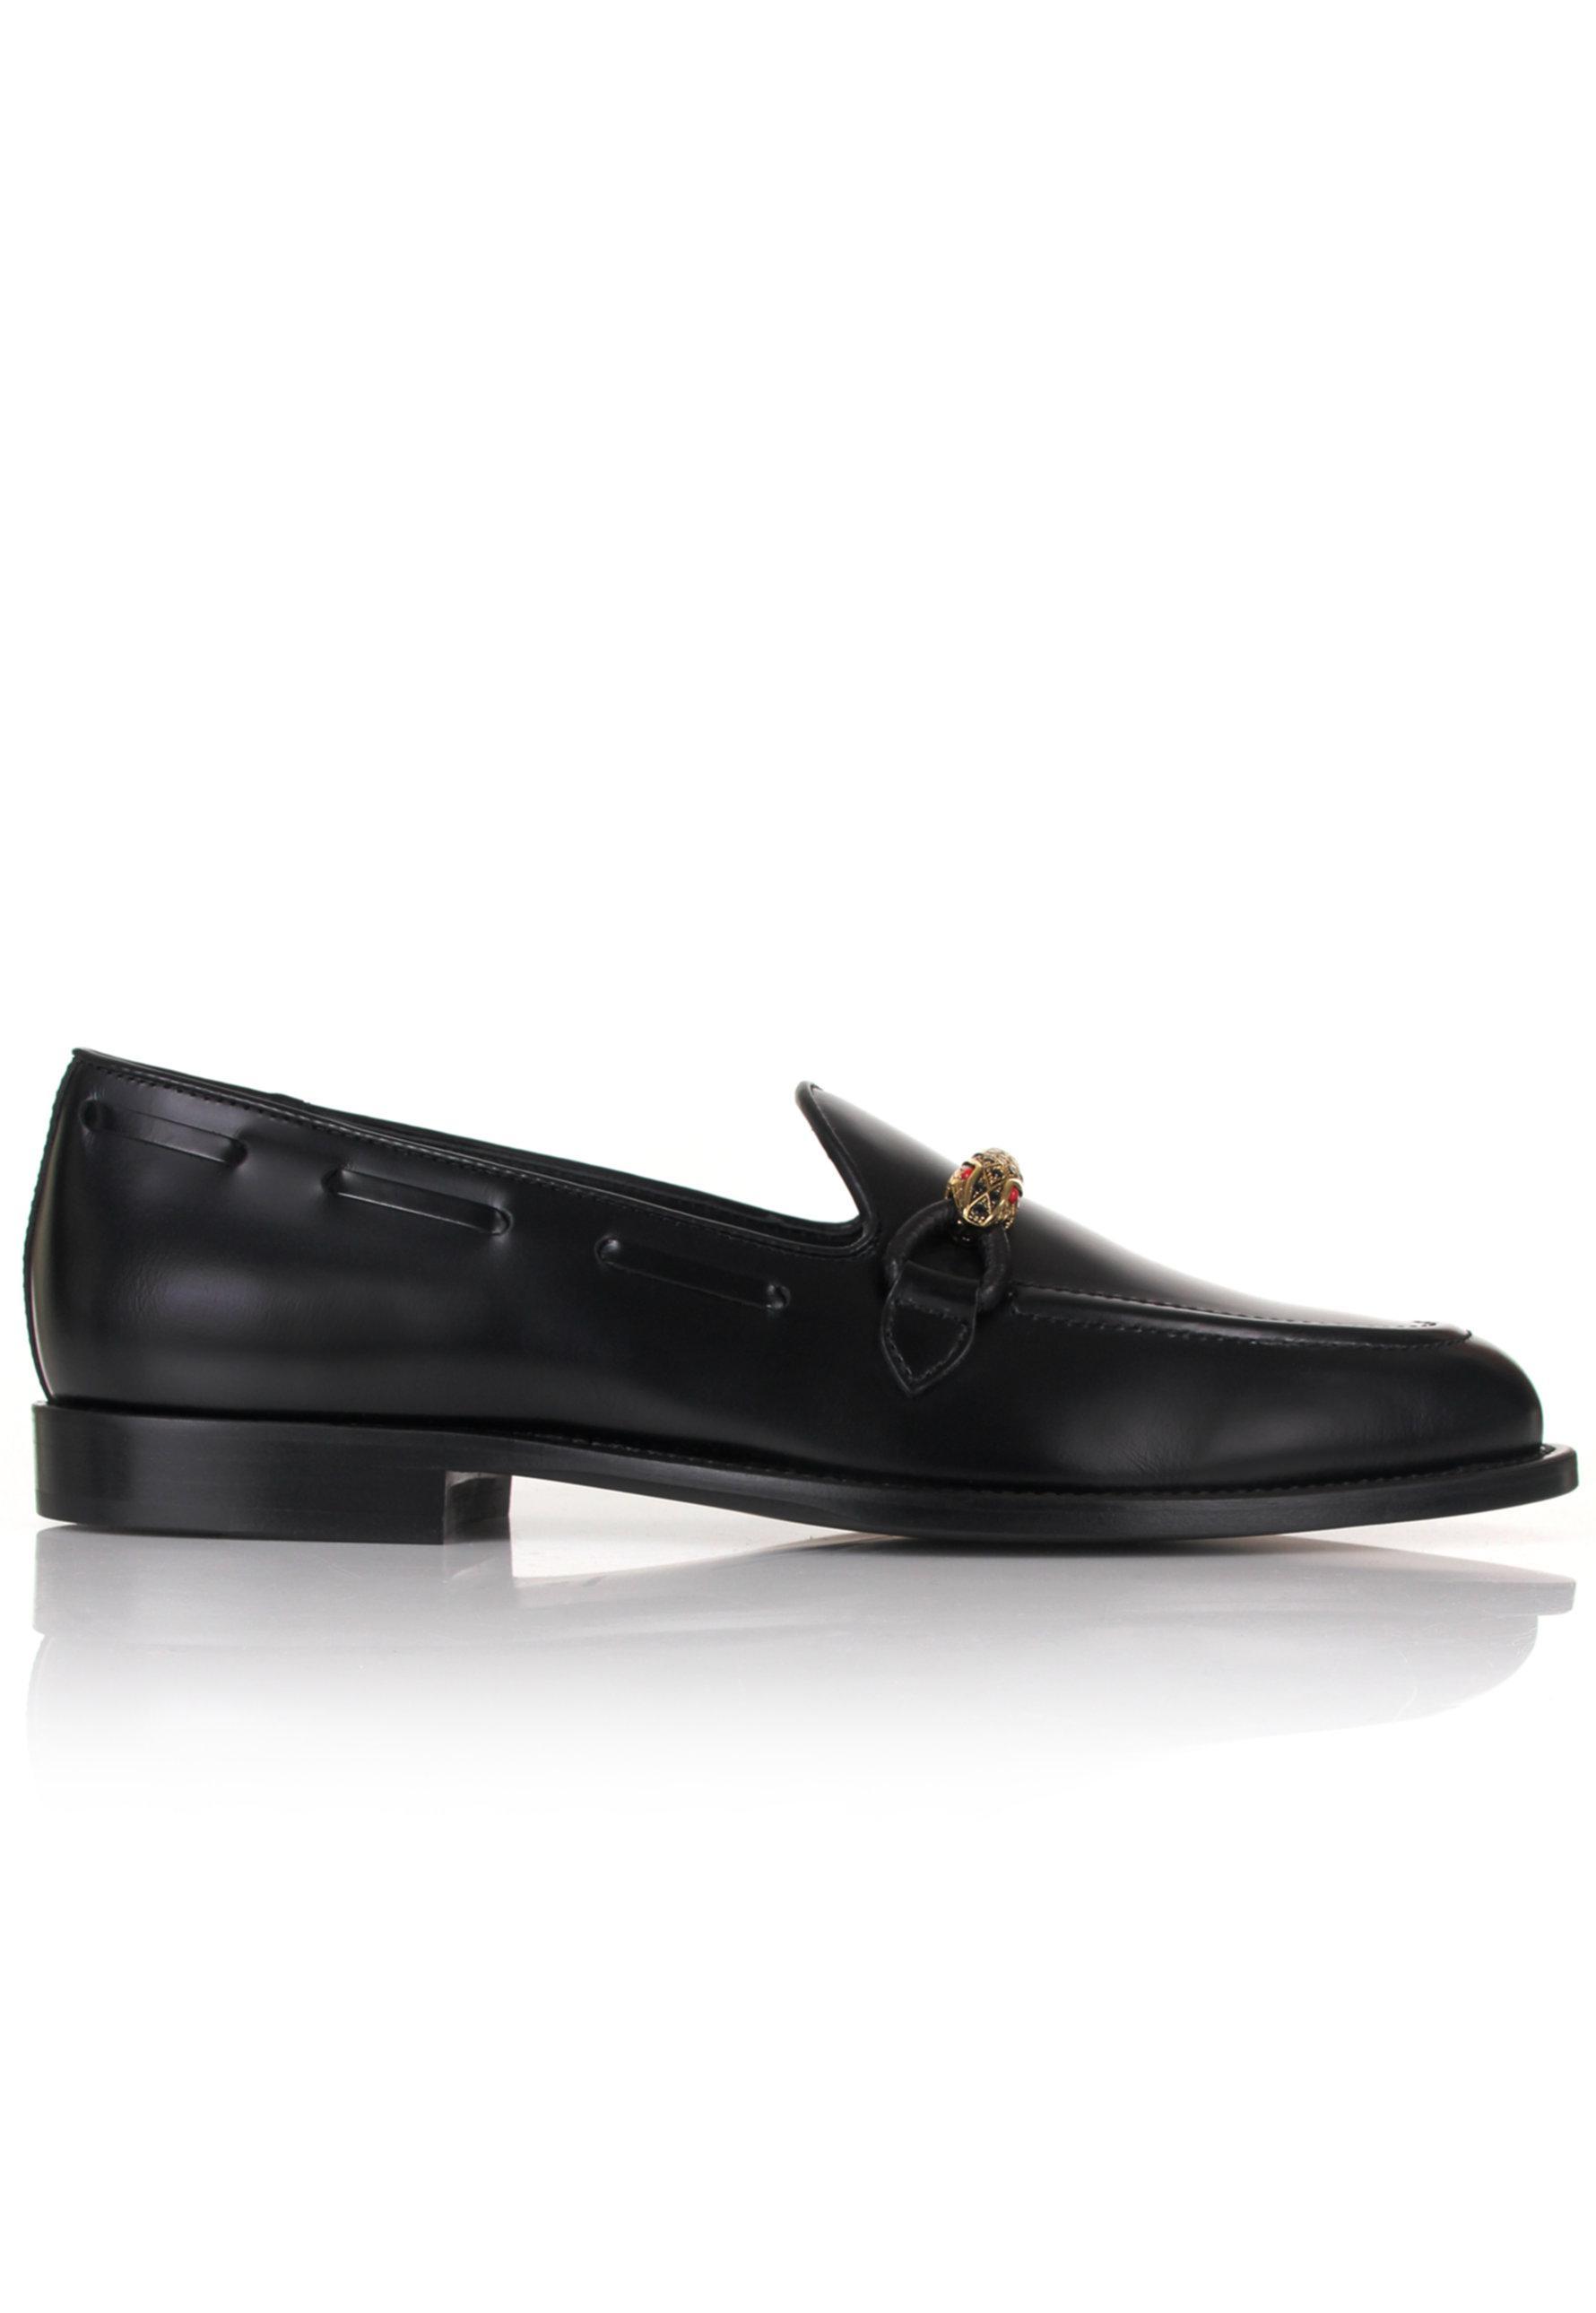 02194b1cd4e3d Giuseppe Zanotti Grady Snake Bit Dress Loafers Black/gold in Black ...